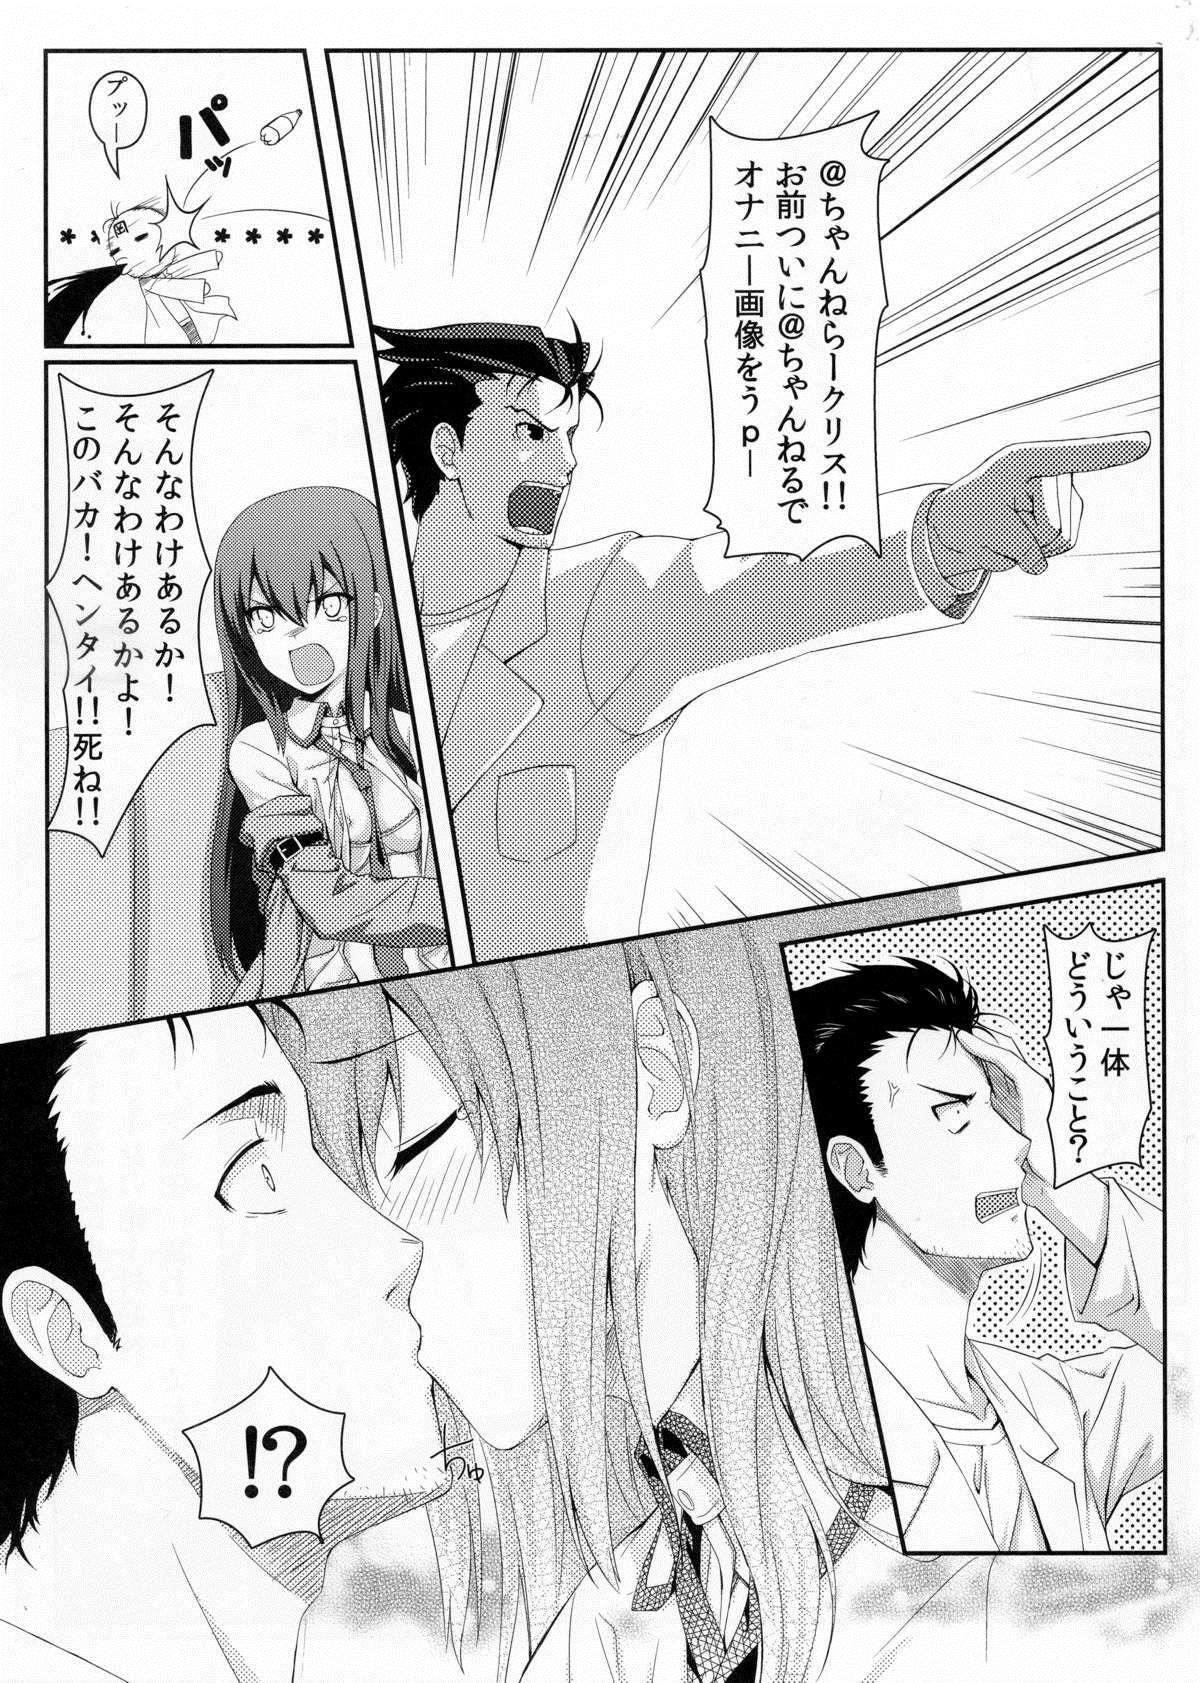 Tengoku e no Bullet Train 11